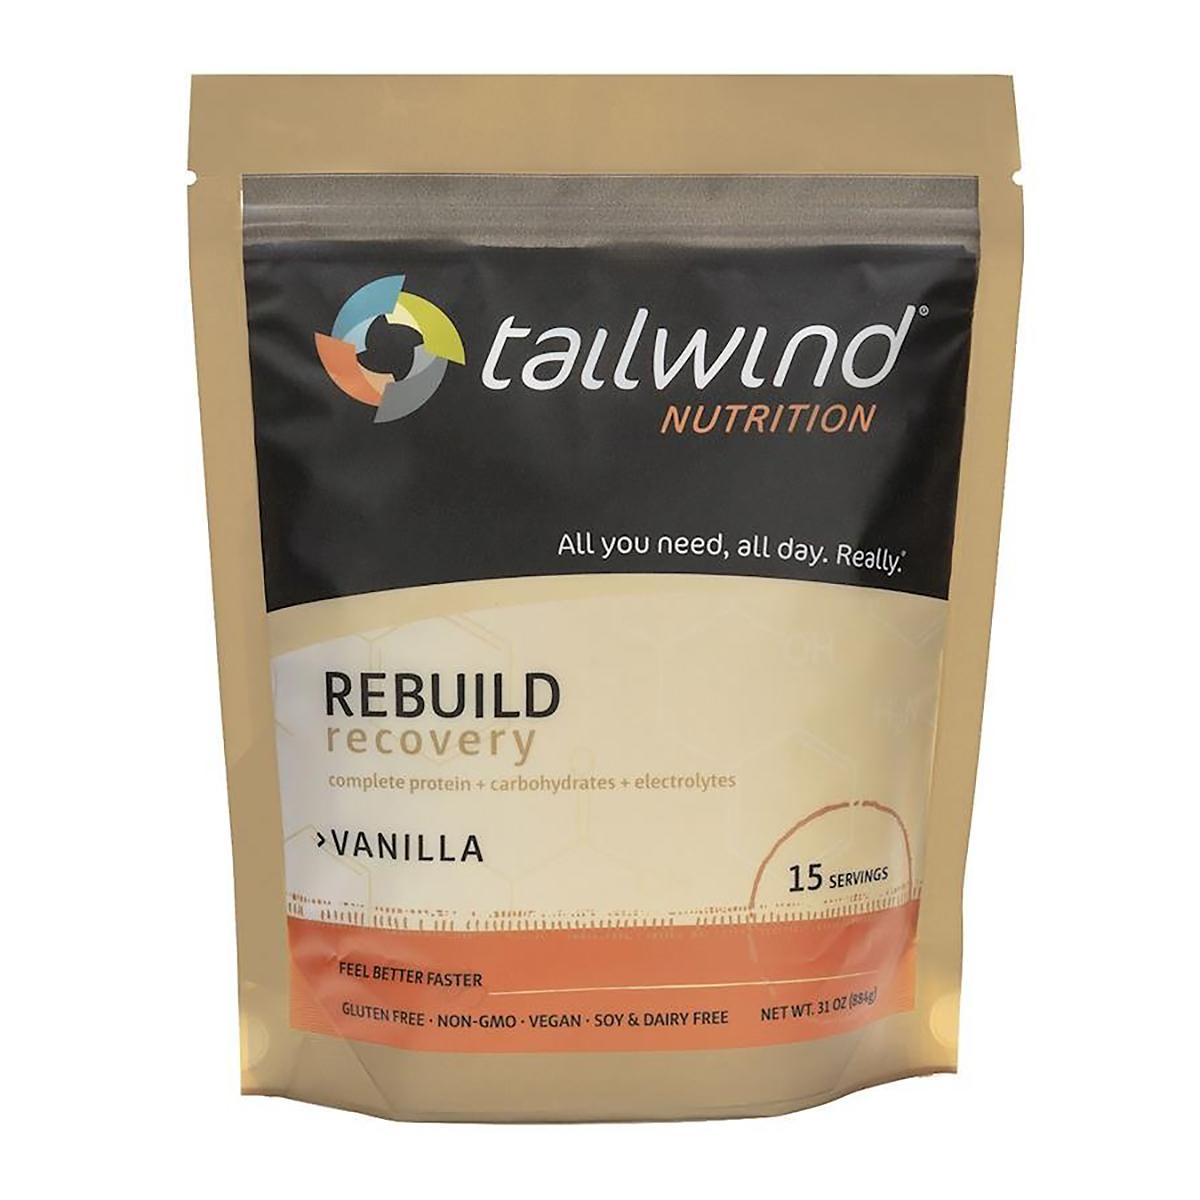 Tailwind Nutrition Rebuild Recovery Fuel - Color: Vanilla - Size: 32oz, Vanilla, large, image 1